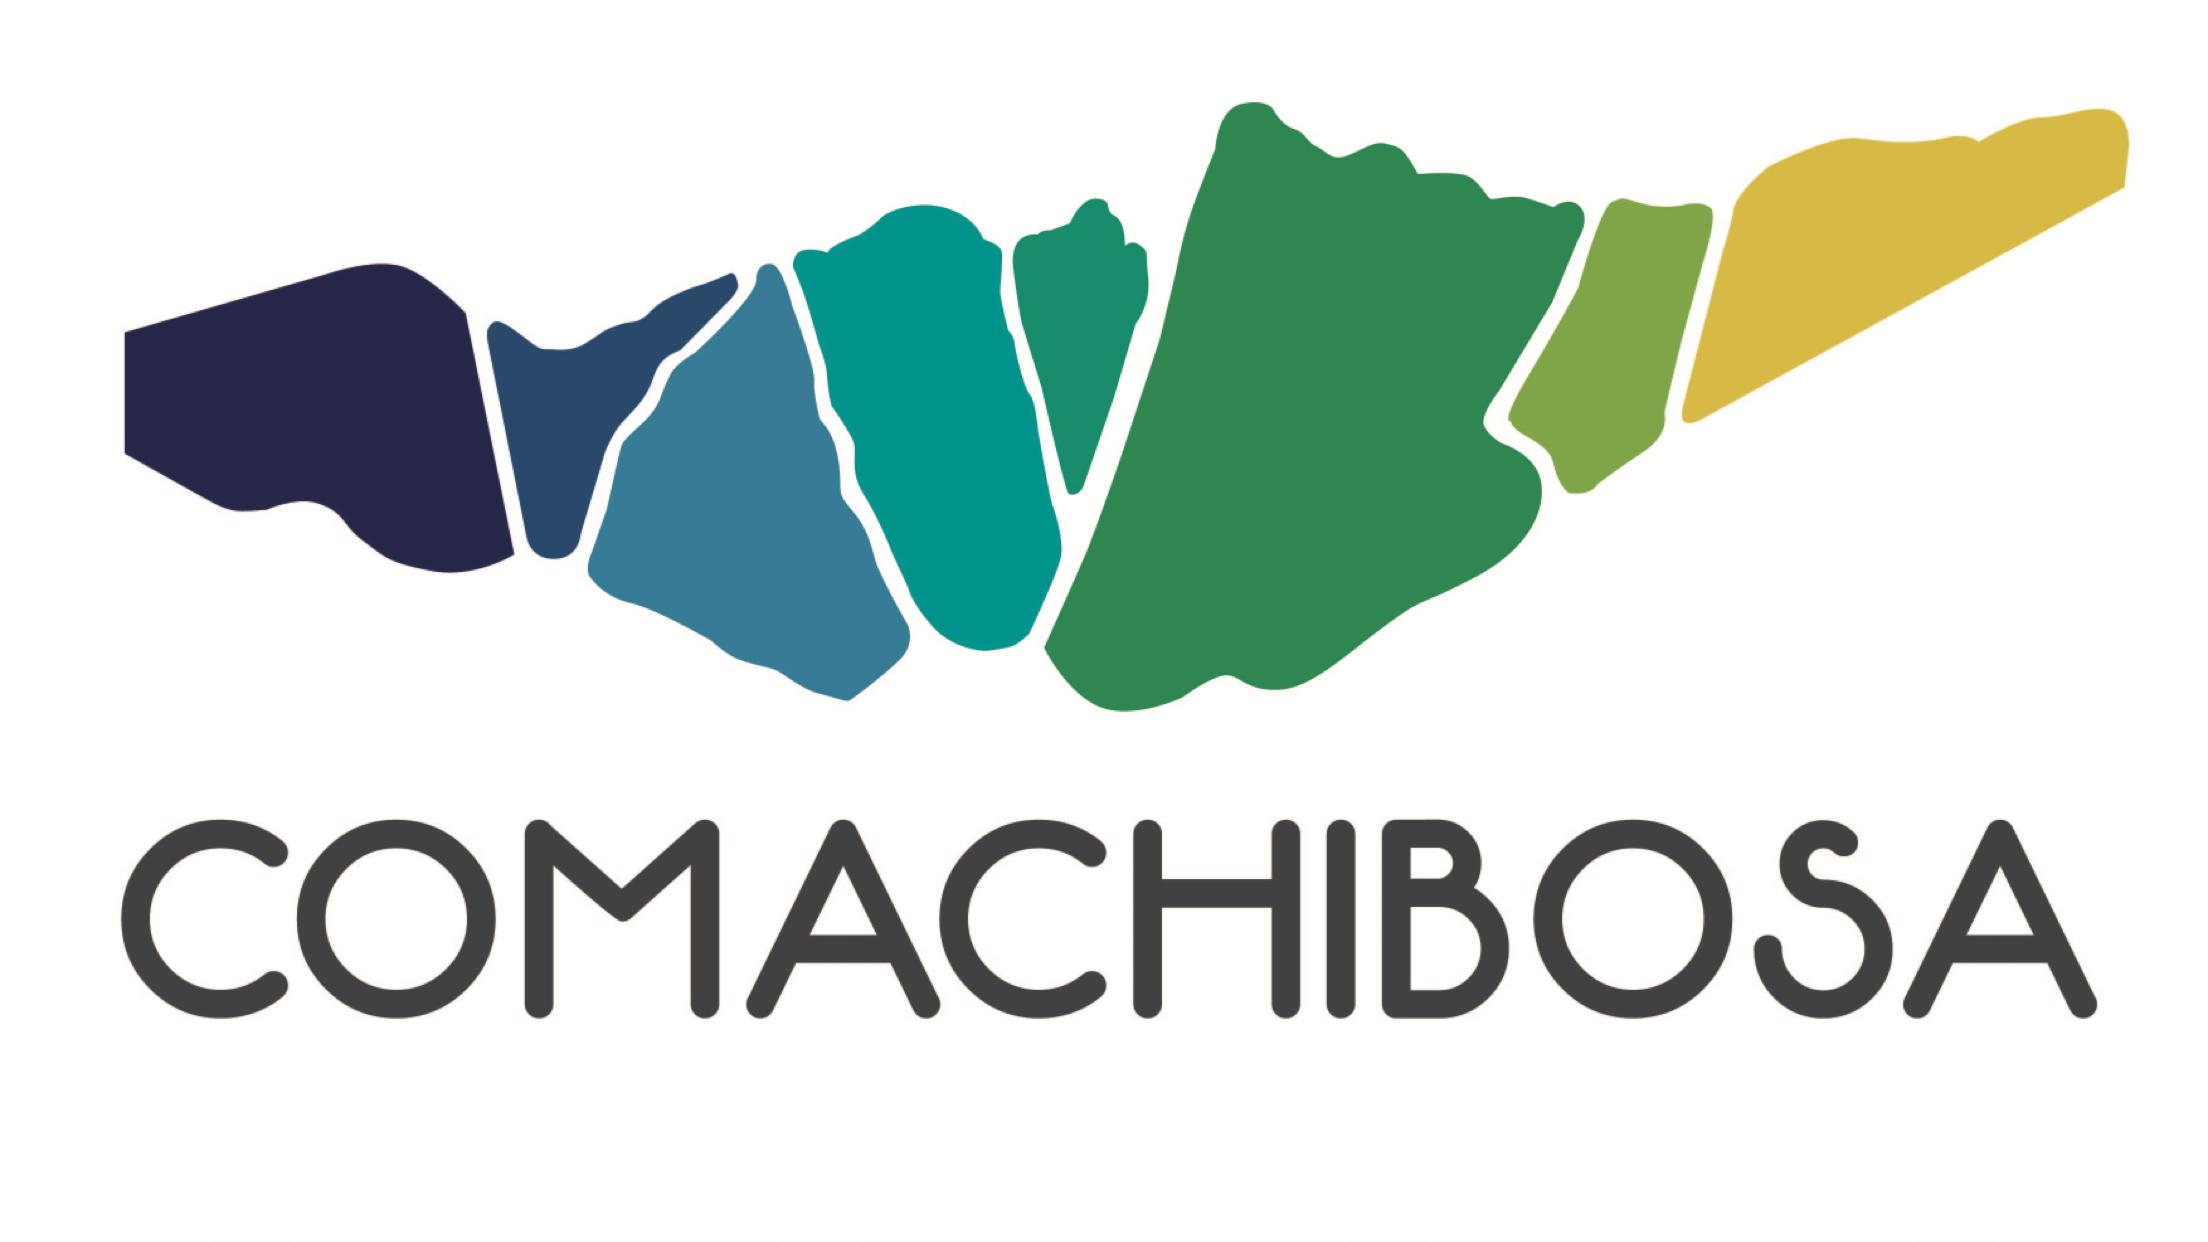 Comachibosa